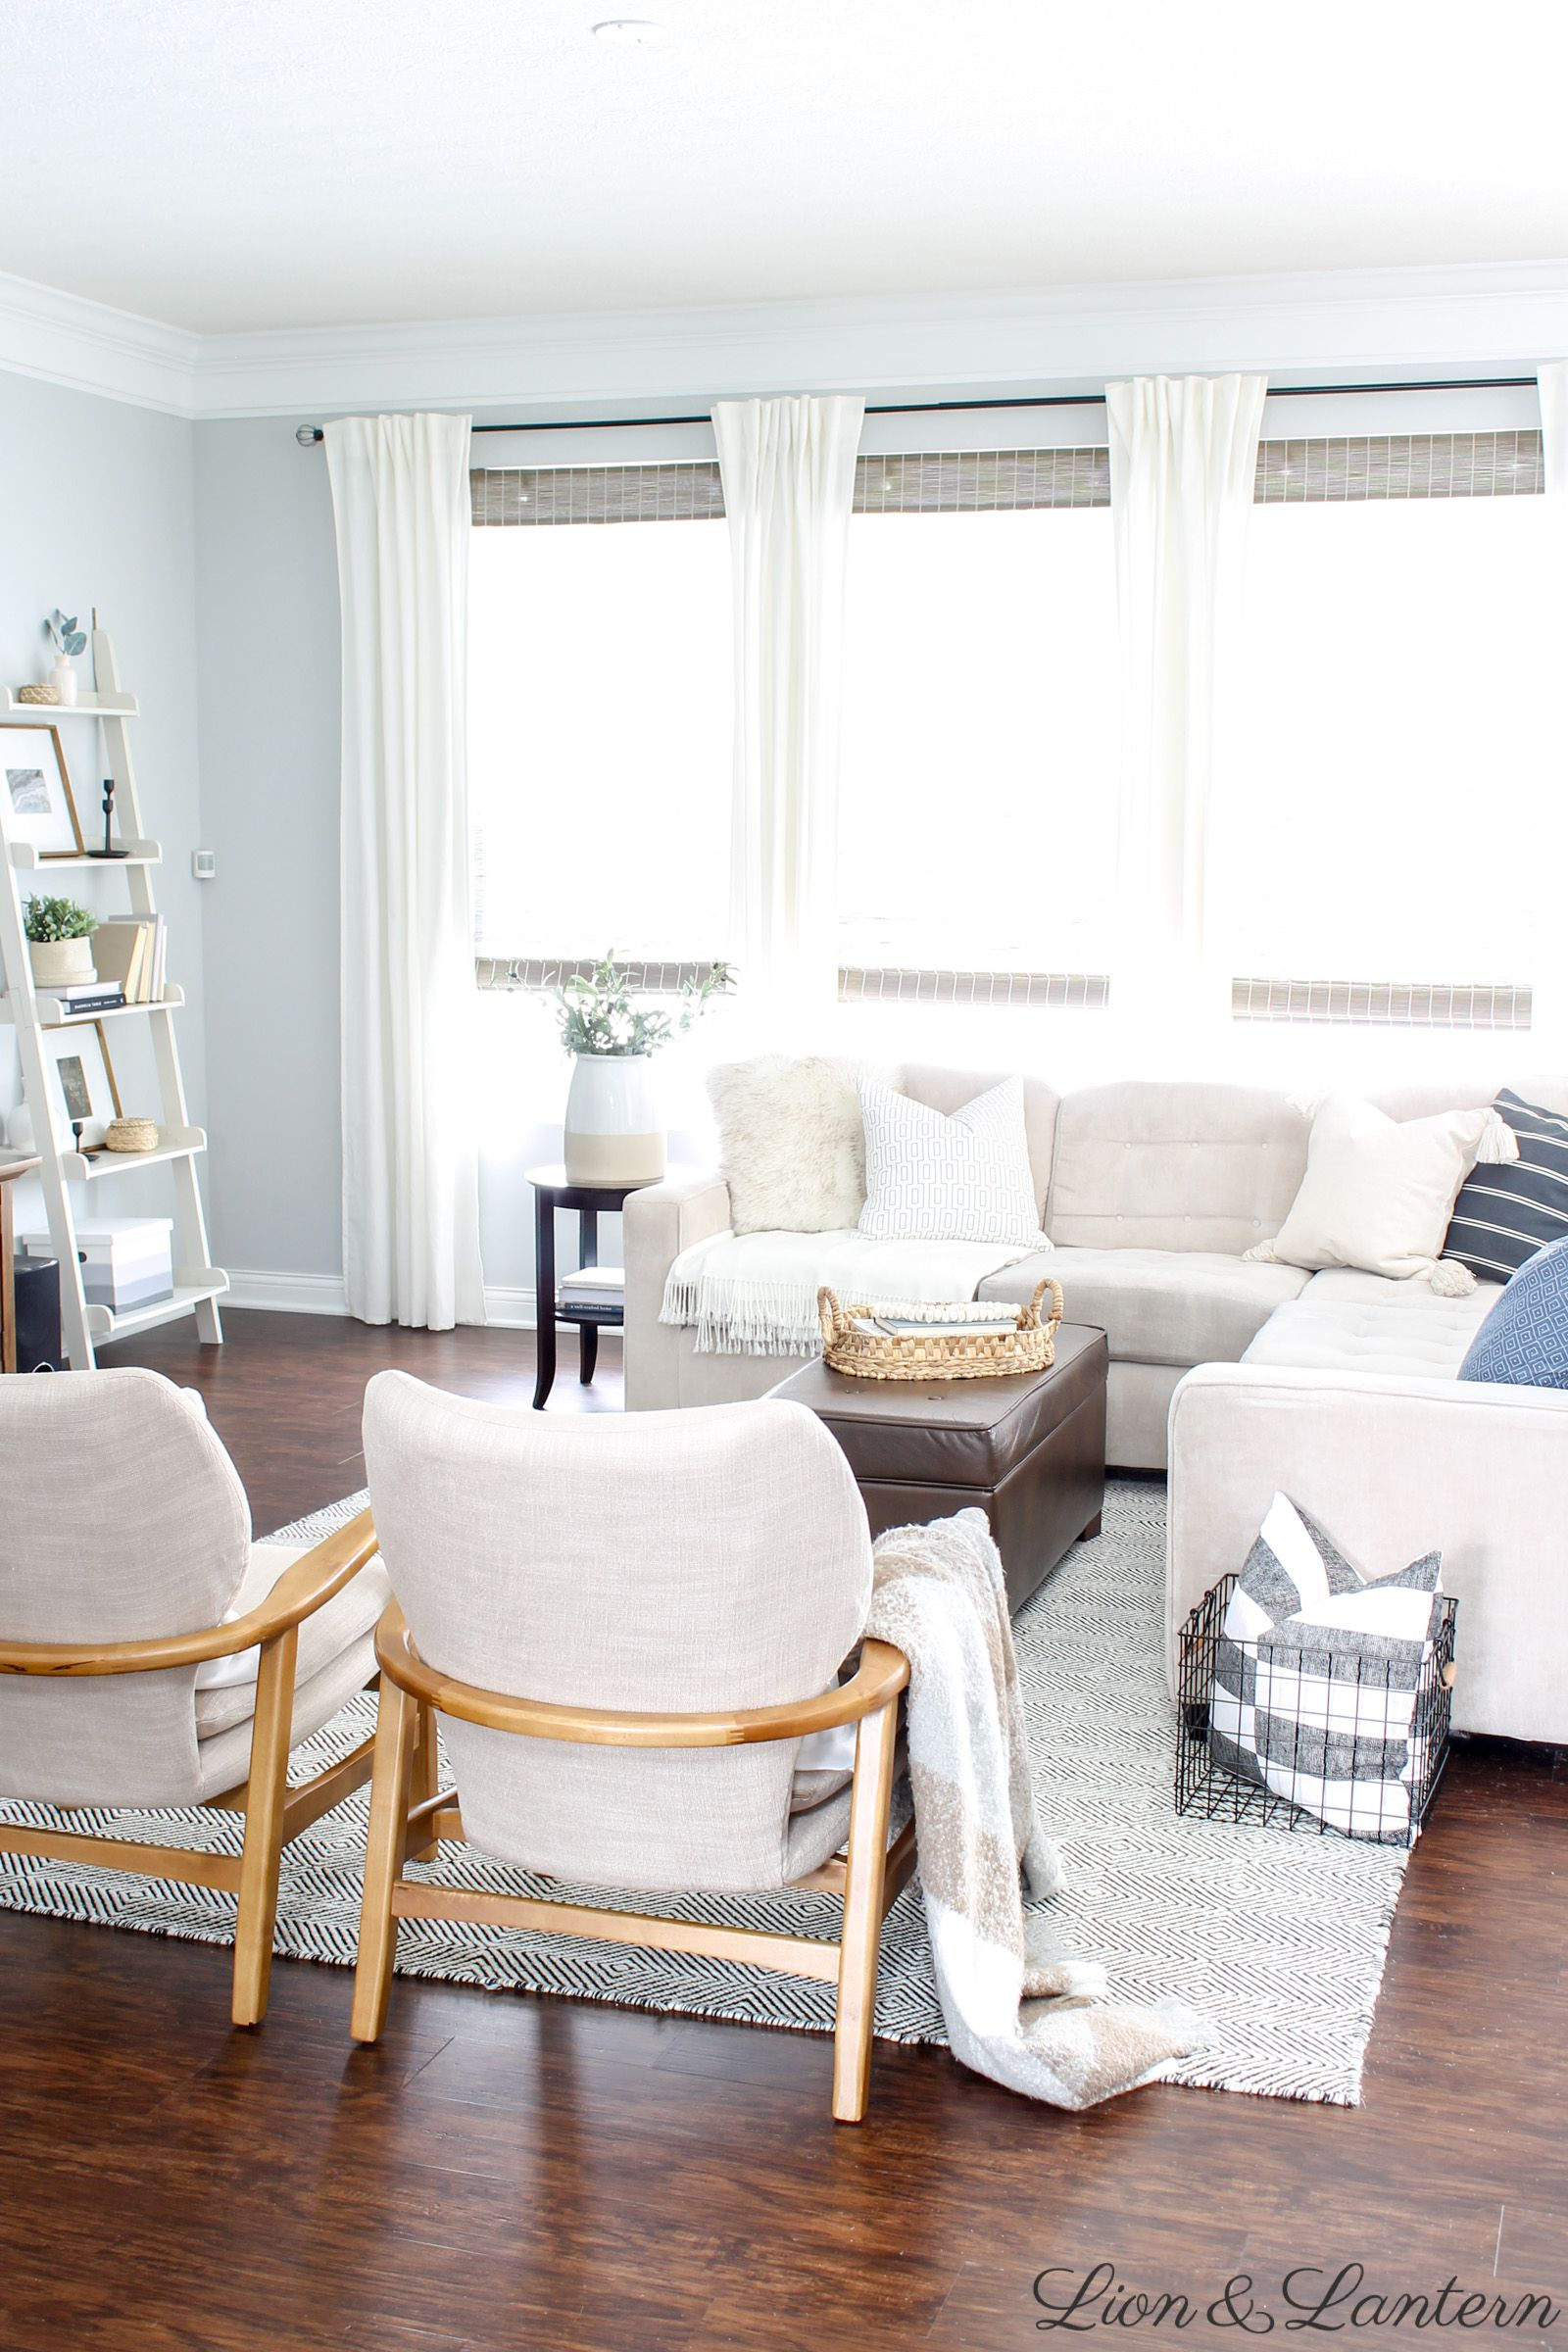 Cozy Coastal Living Room at LionAndLantern.com  coastal farmhouse